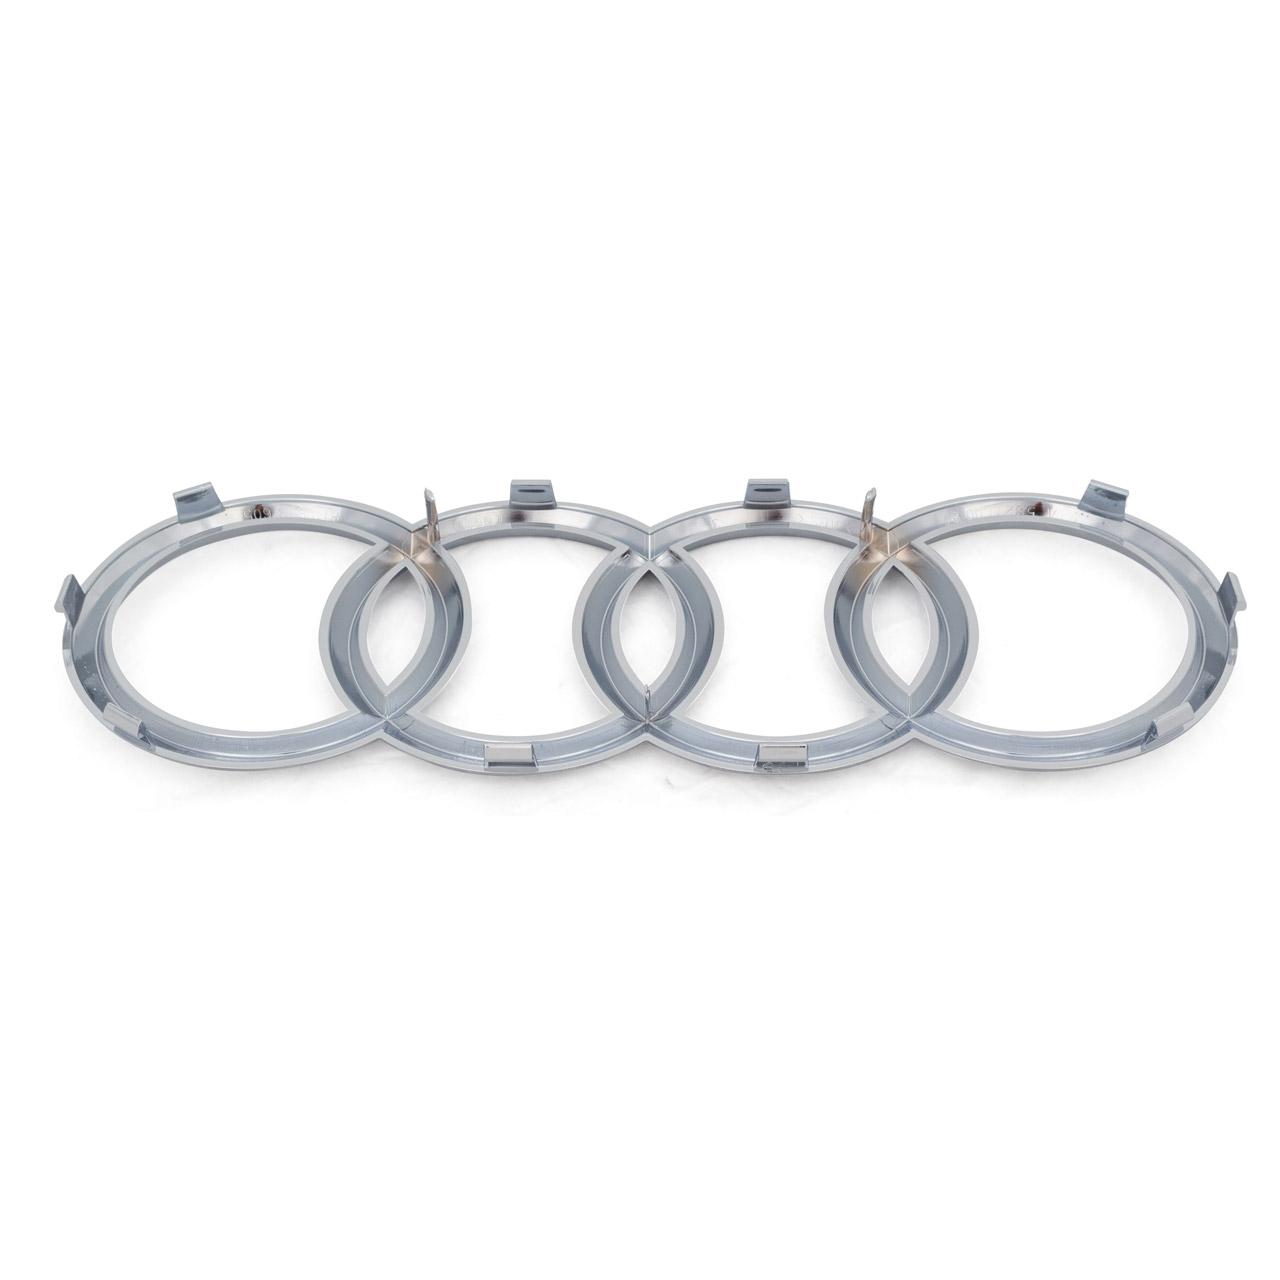 ORIGINAL Audi Emblem Ringe Logo Grill A1 GBH GBA A6 C8 A7 4K vorne 8T0853605 2ZZ